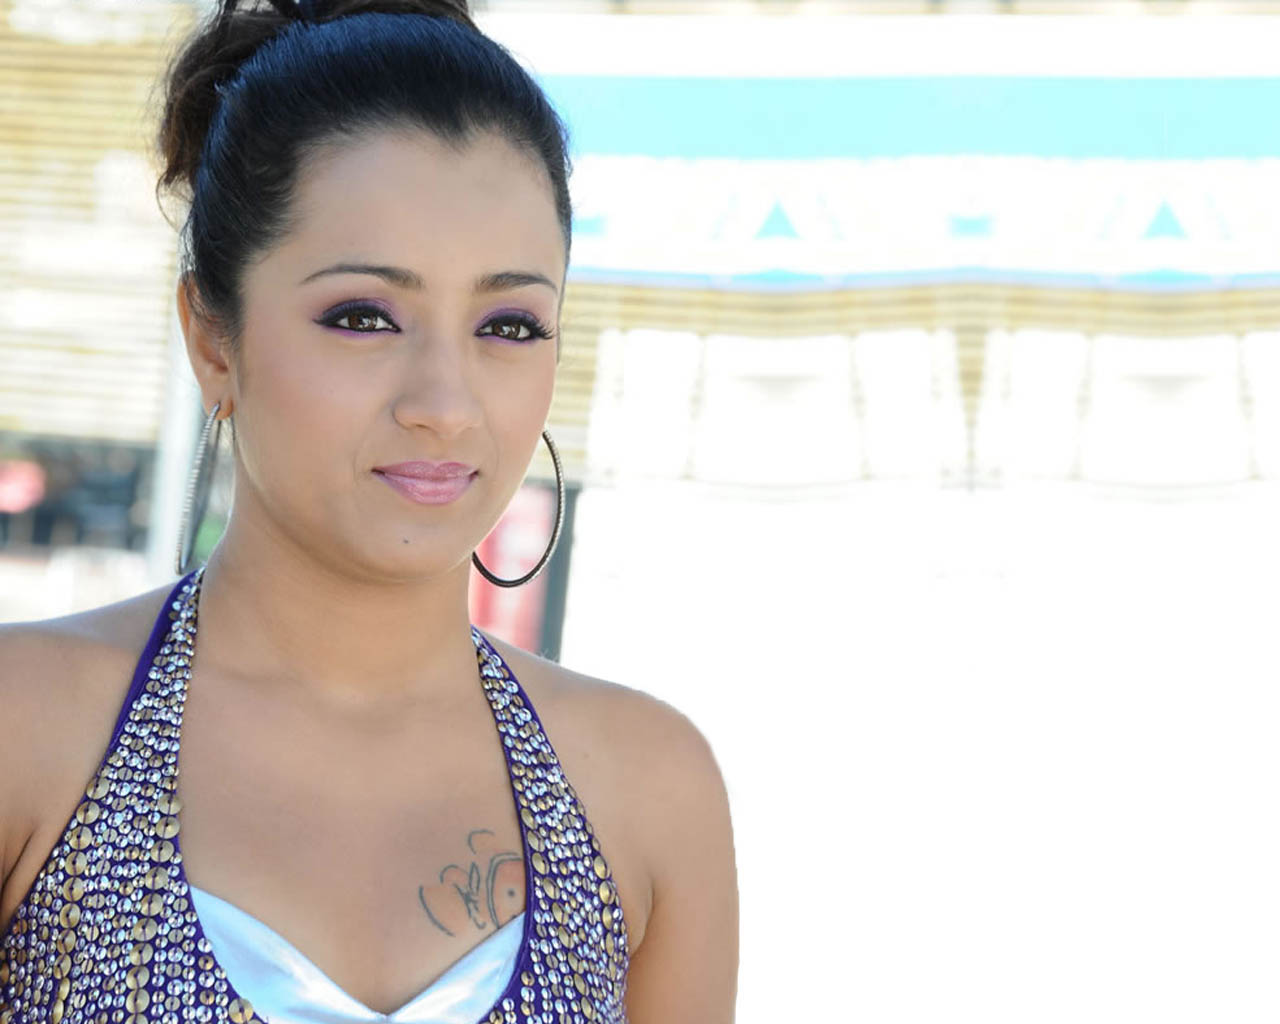 South Indian Actress Hd Wallpapers Bollywood Actress Hd